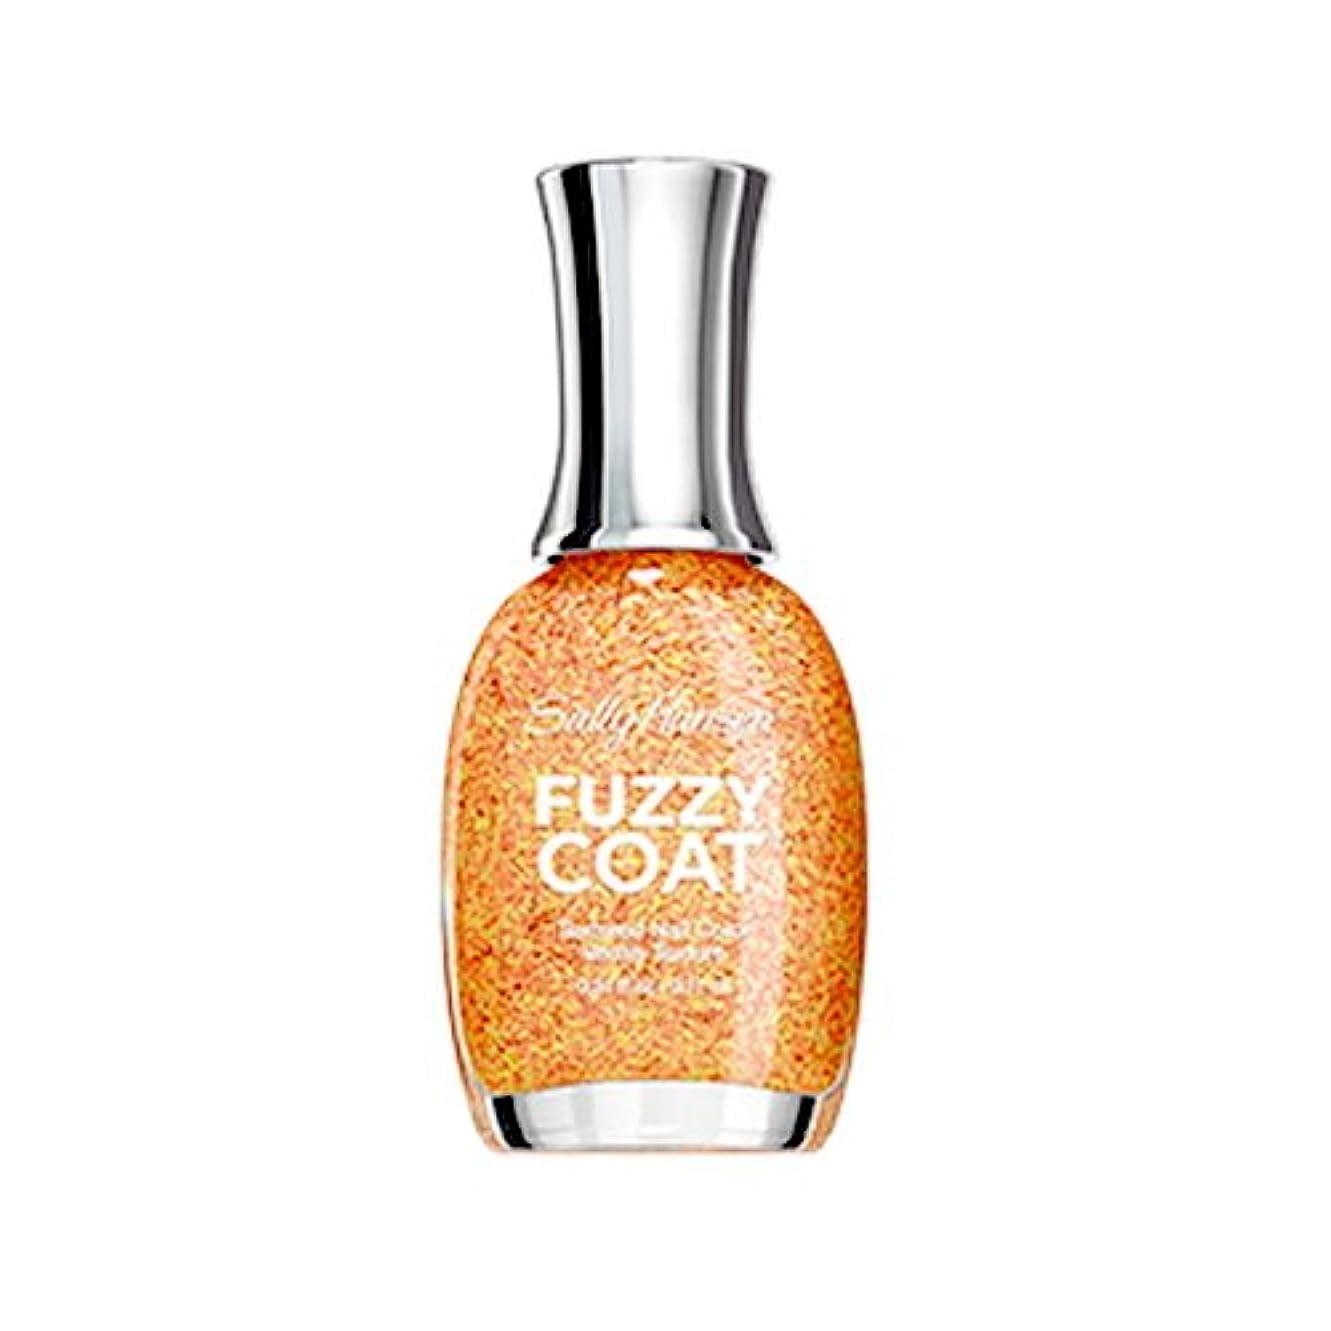 妻債権者放送(6 Pack) SALLY HANSEN Fuzzy Coat Special Effect Textured Nail Color - Peach Fuzz (並行輸入品)